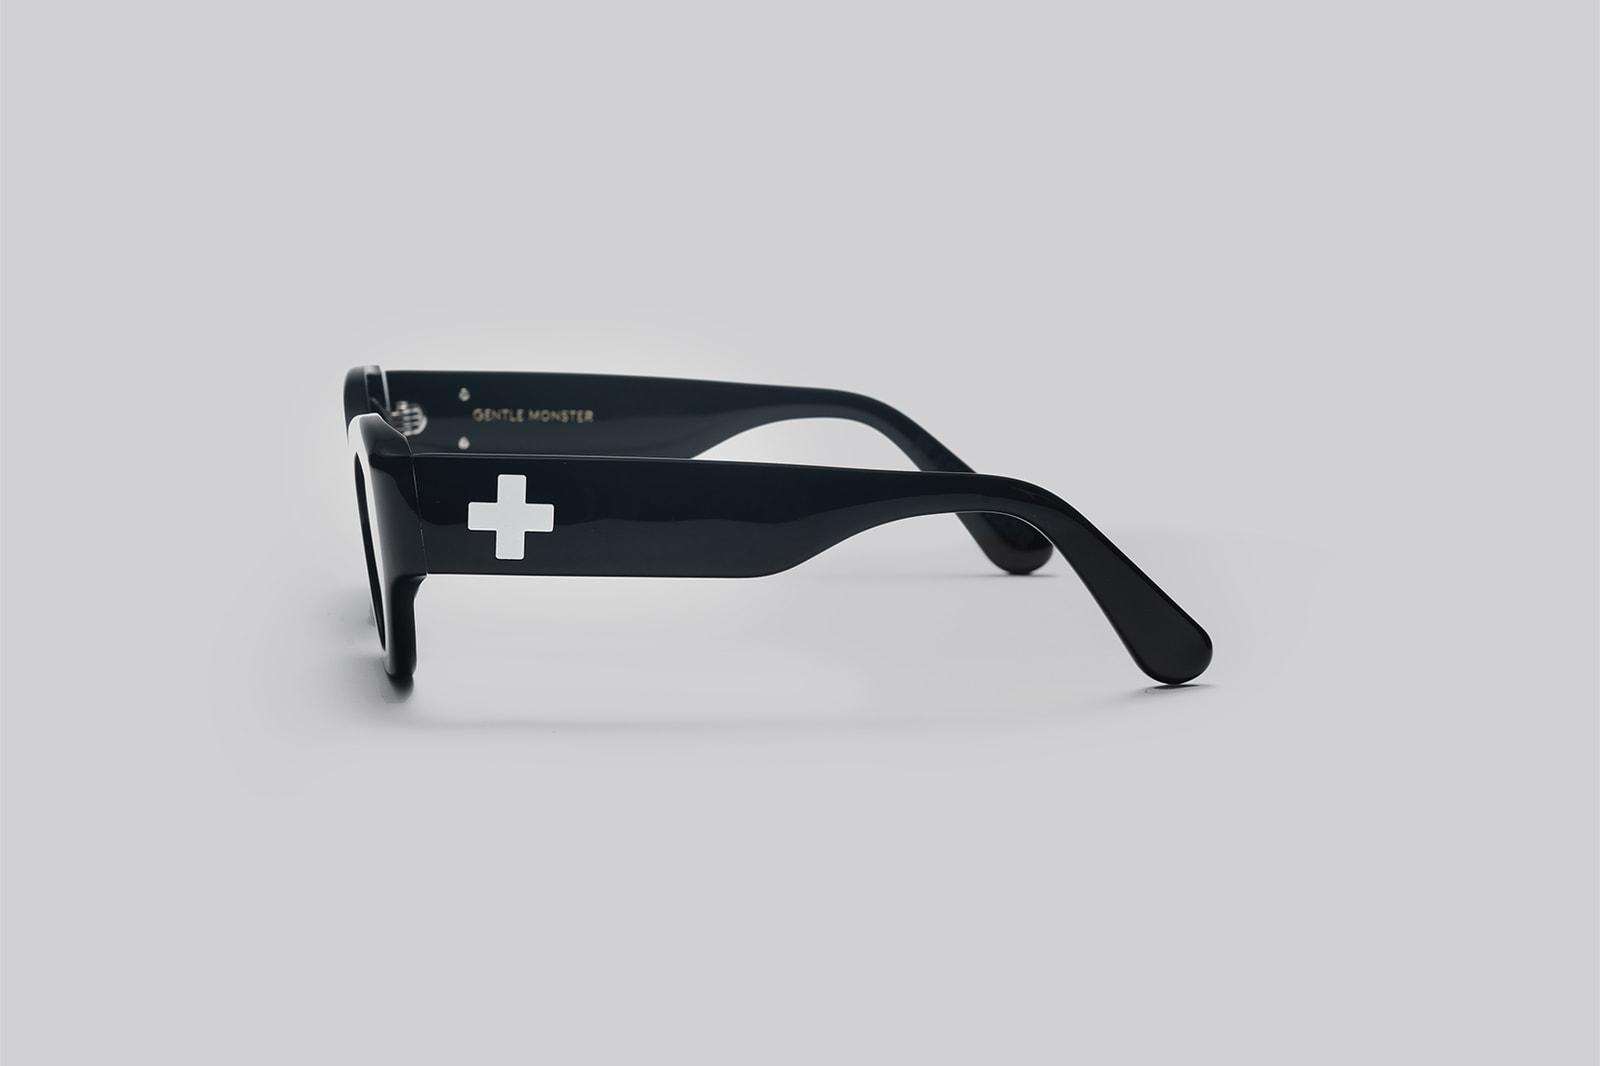 Places Faces Gentle Monster Sunglasses Collaboration 2018 release date info drop